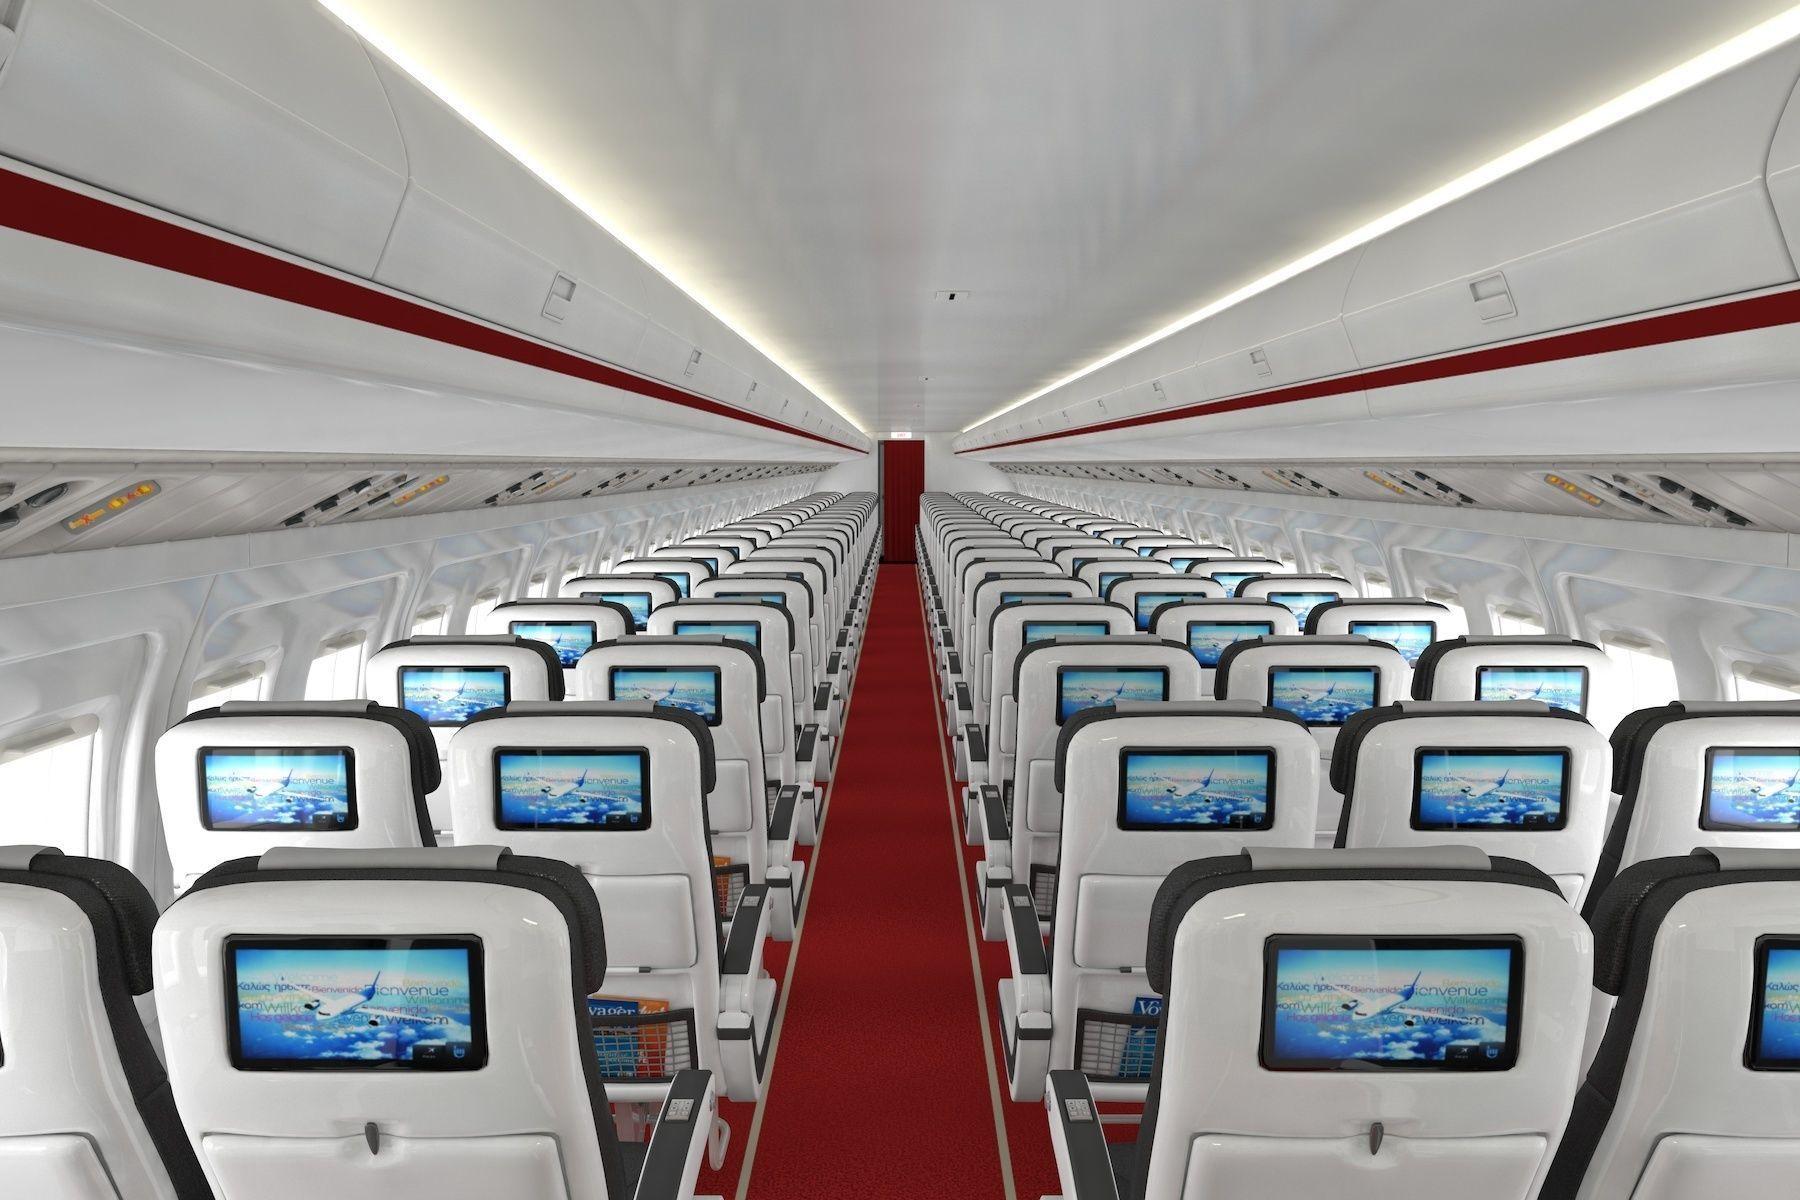 Airplane cabin 109 Seats